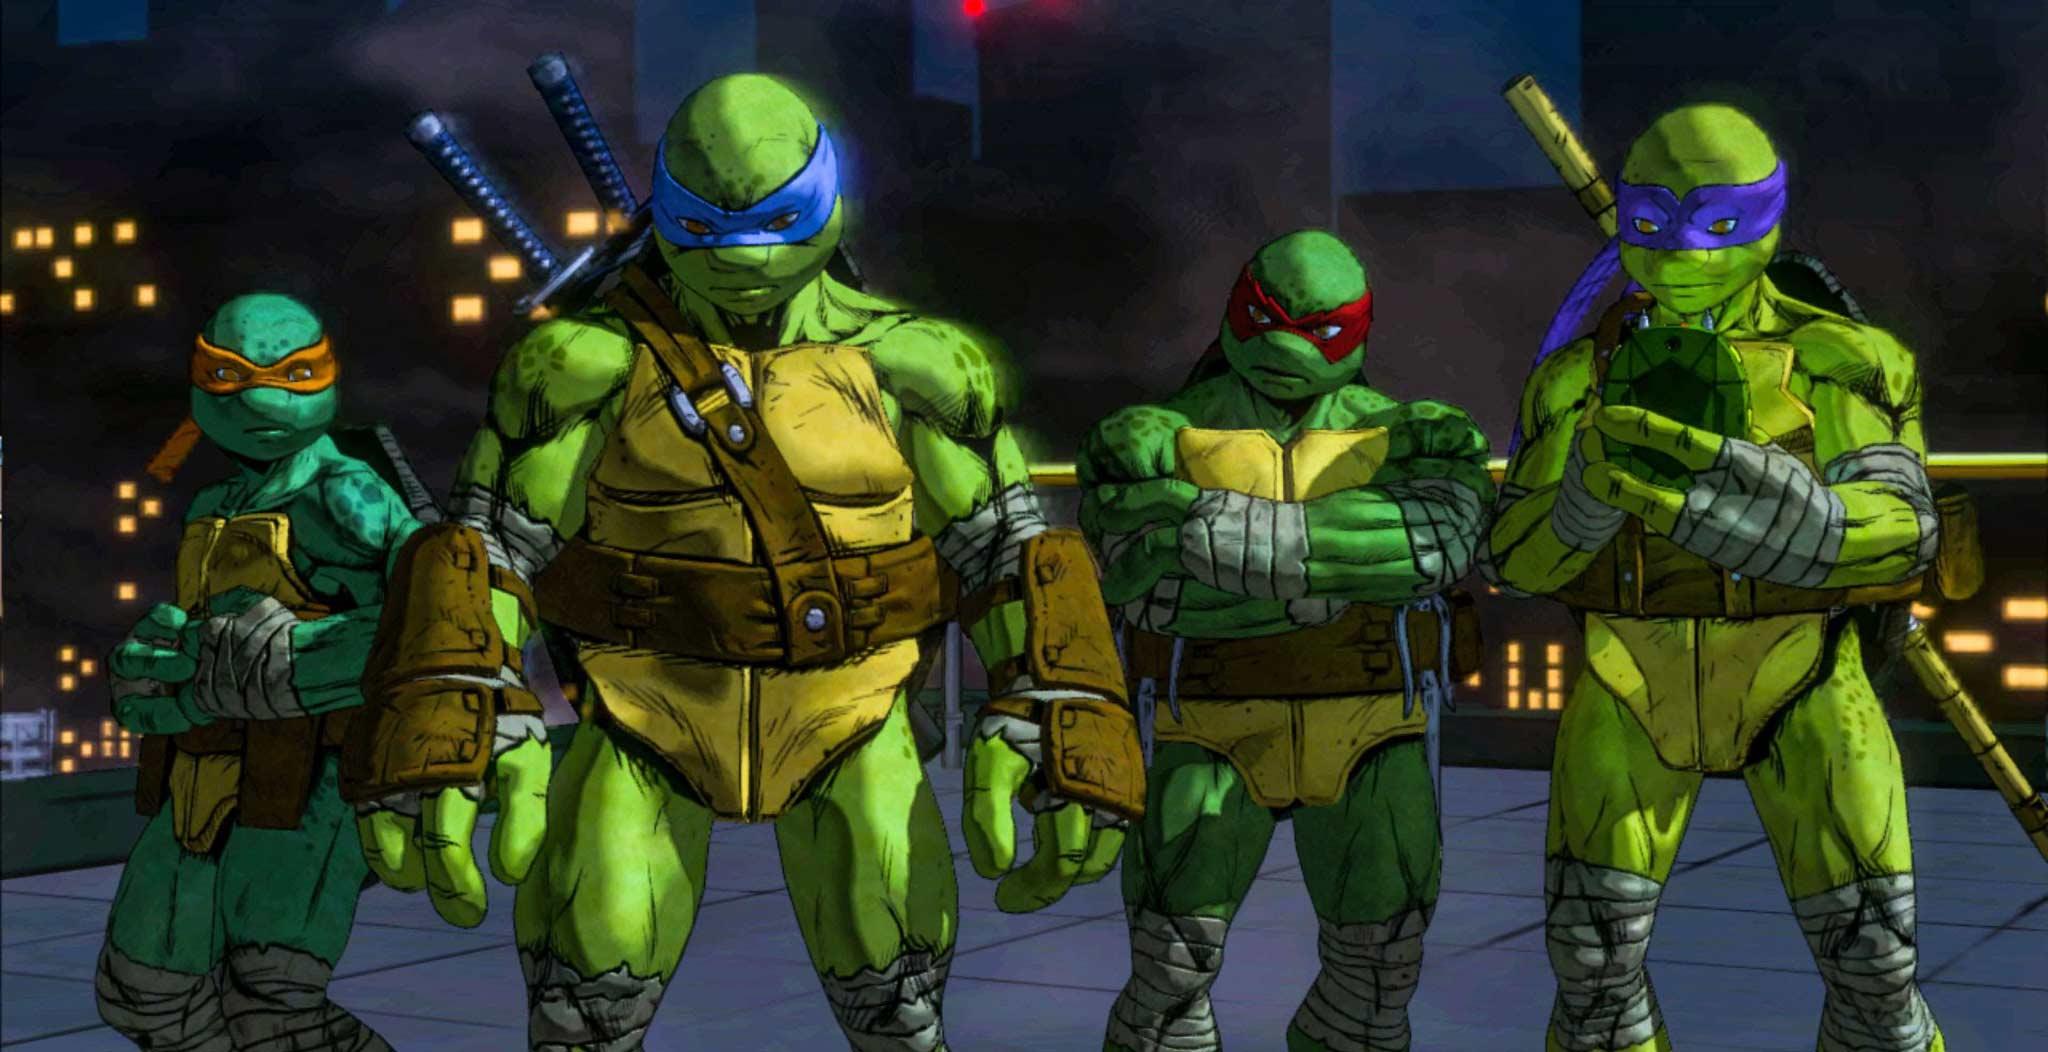 Teenage Mutant Ninja Turtles tendrá reboot animado con Nickelodeon